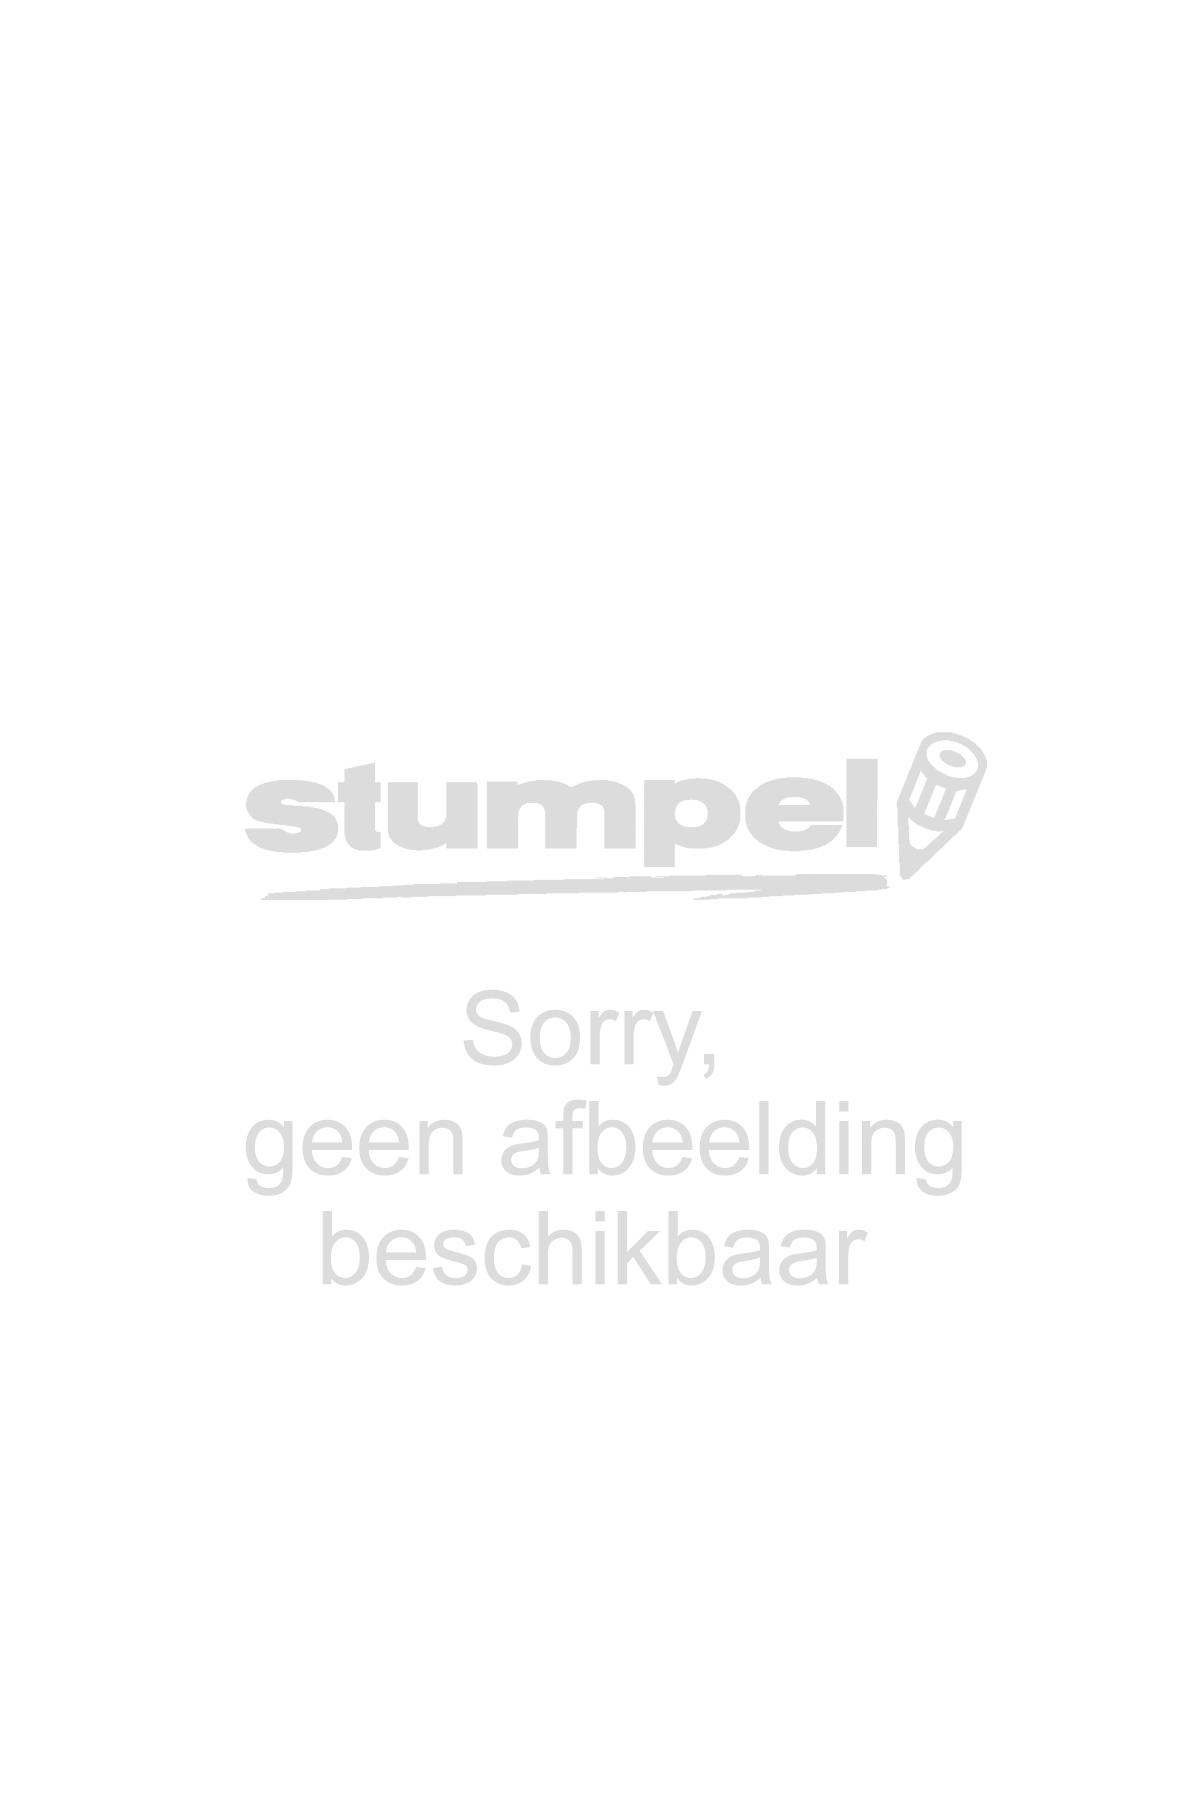 briefopener-maul-75340-96-metaal-bruine-handgreep-334052